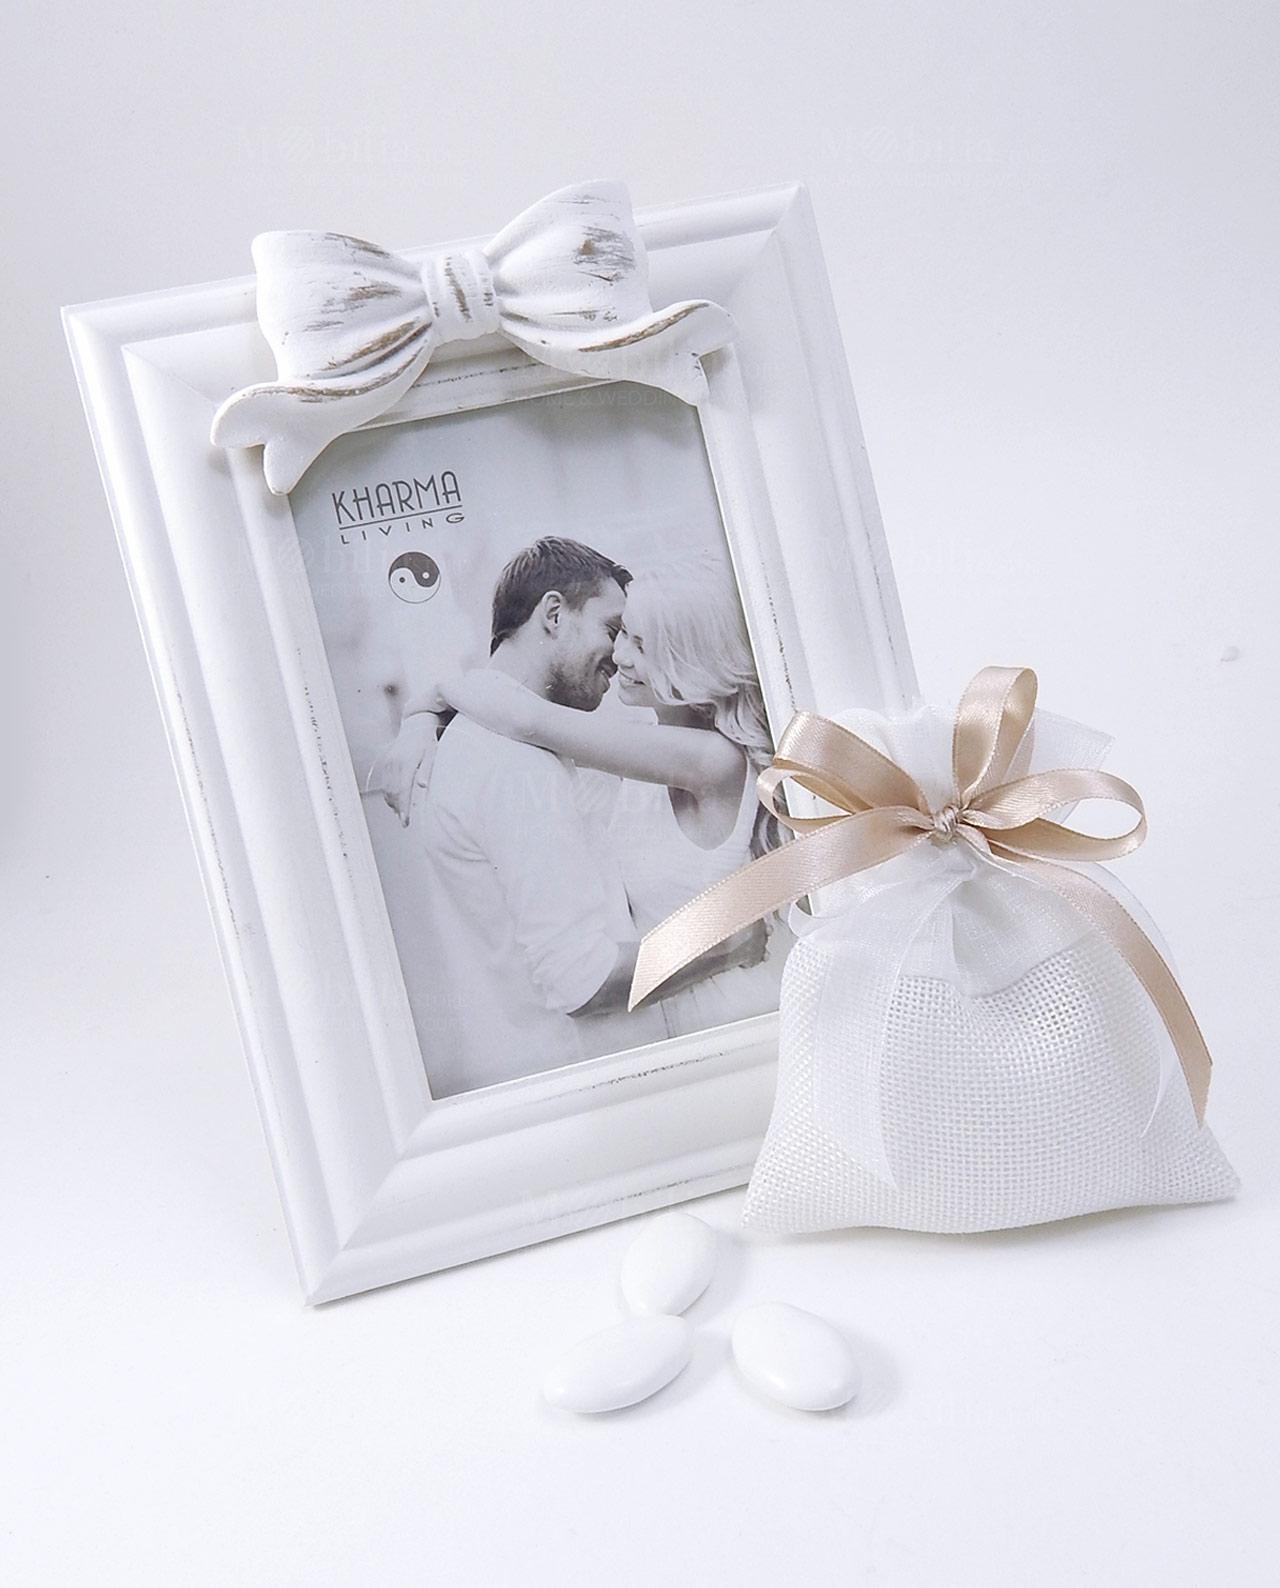 bomboniera shabby chic portafoto rettangolare bianco. Black Bedroom Furniture Sets. Home Design Ideas